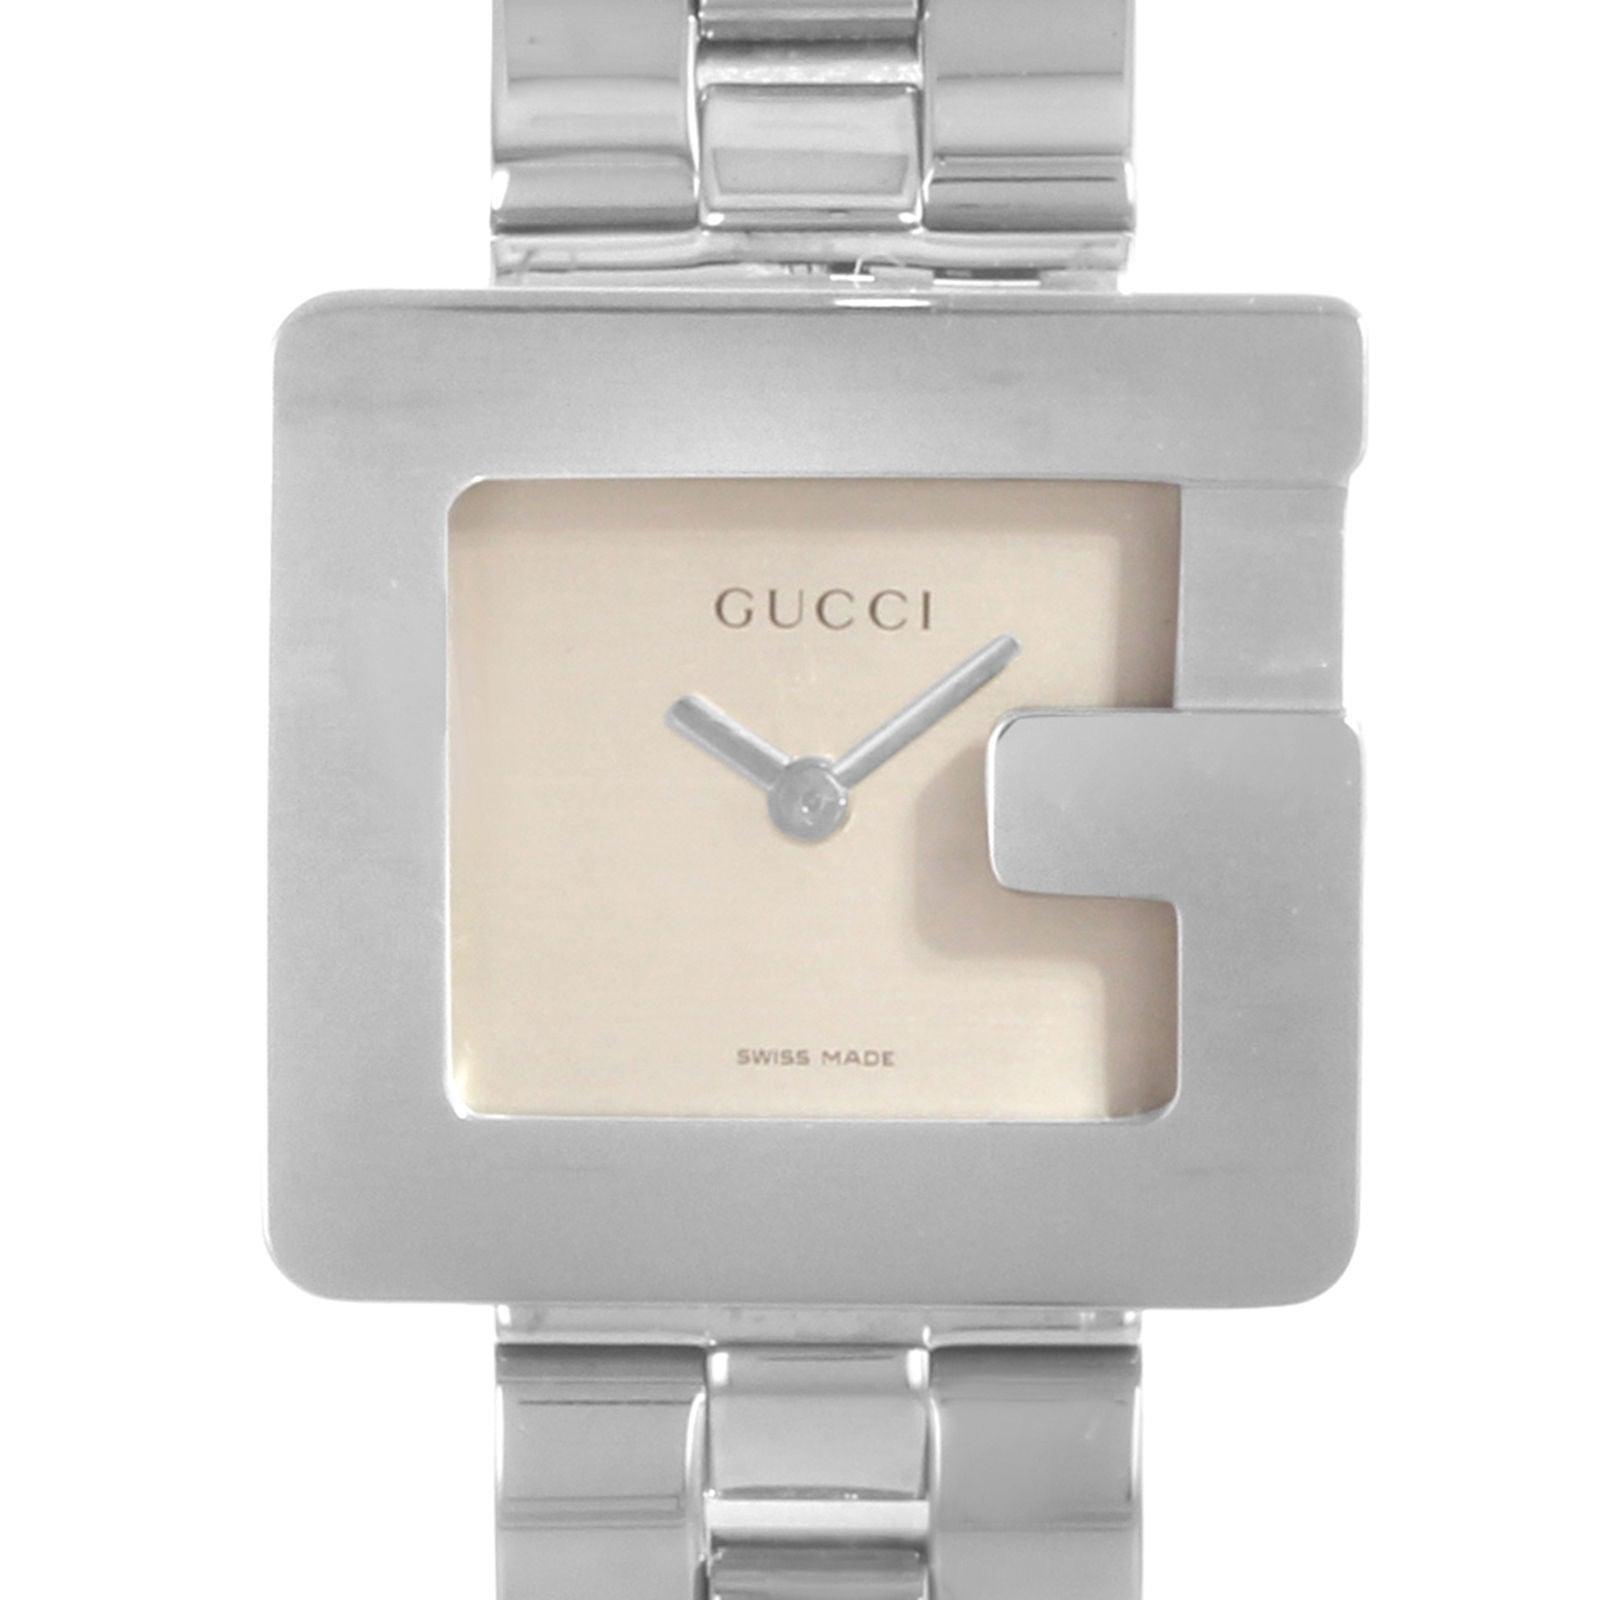 9fcb004f3ae Gucci 3600L Square Face Silver Dial Steel Quartz Ladies Watch YA036504 For  Sale at 1stdibs